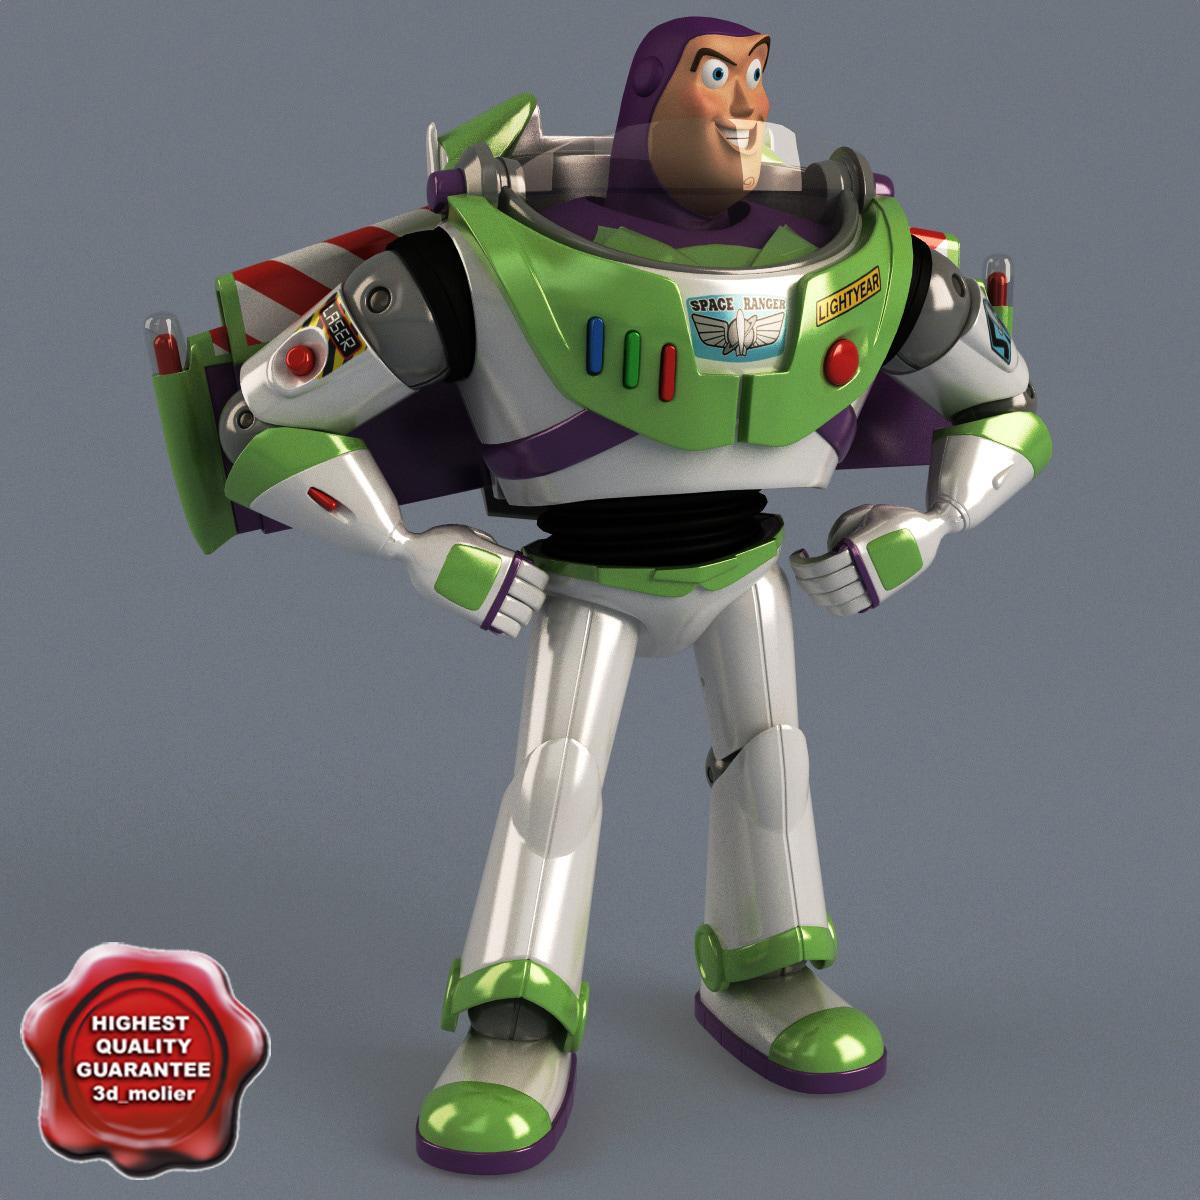 Buzz Lightyear Pose 1